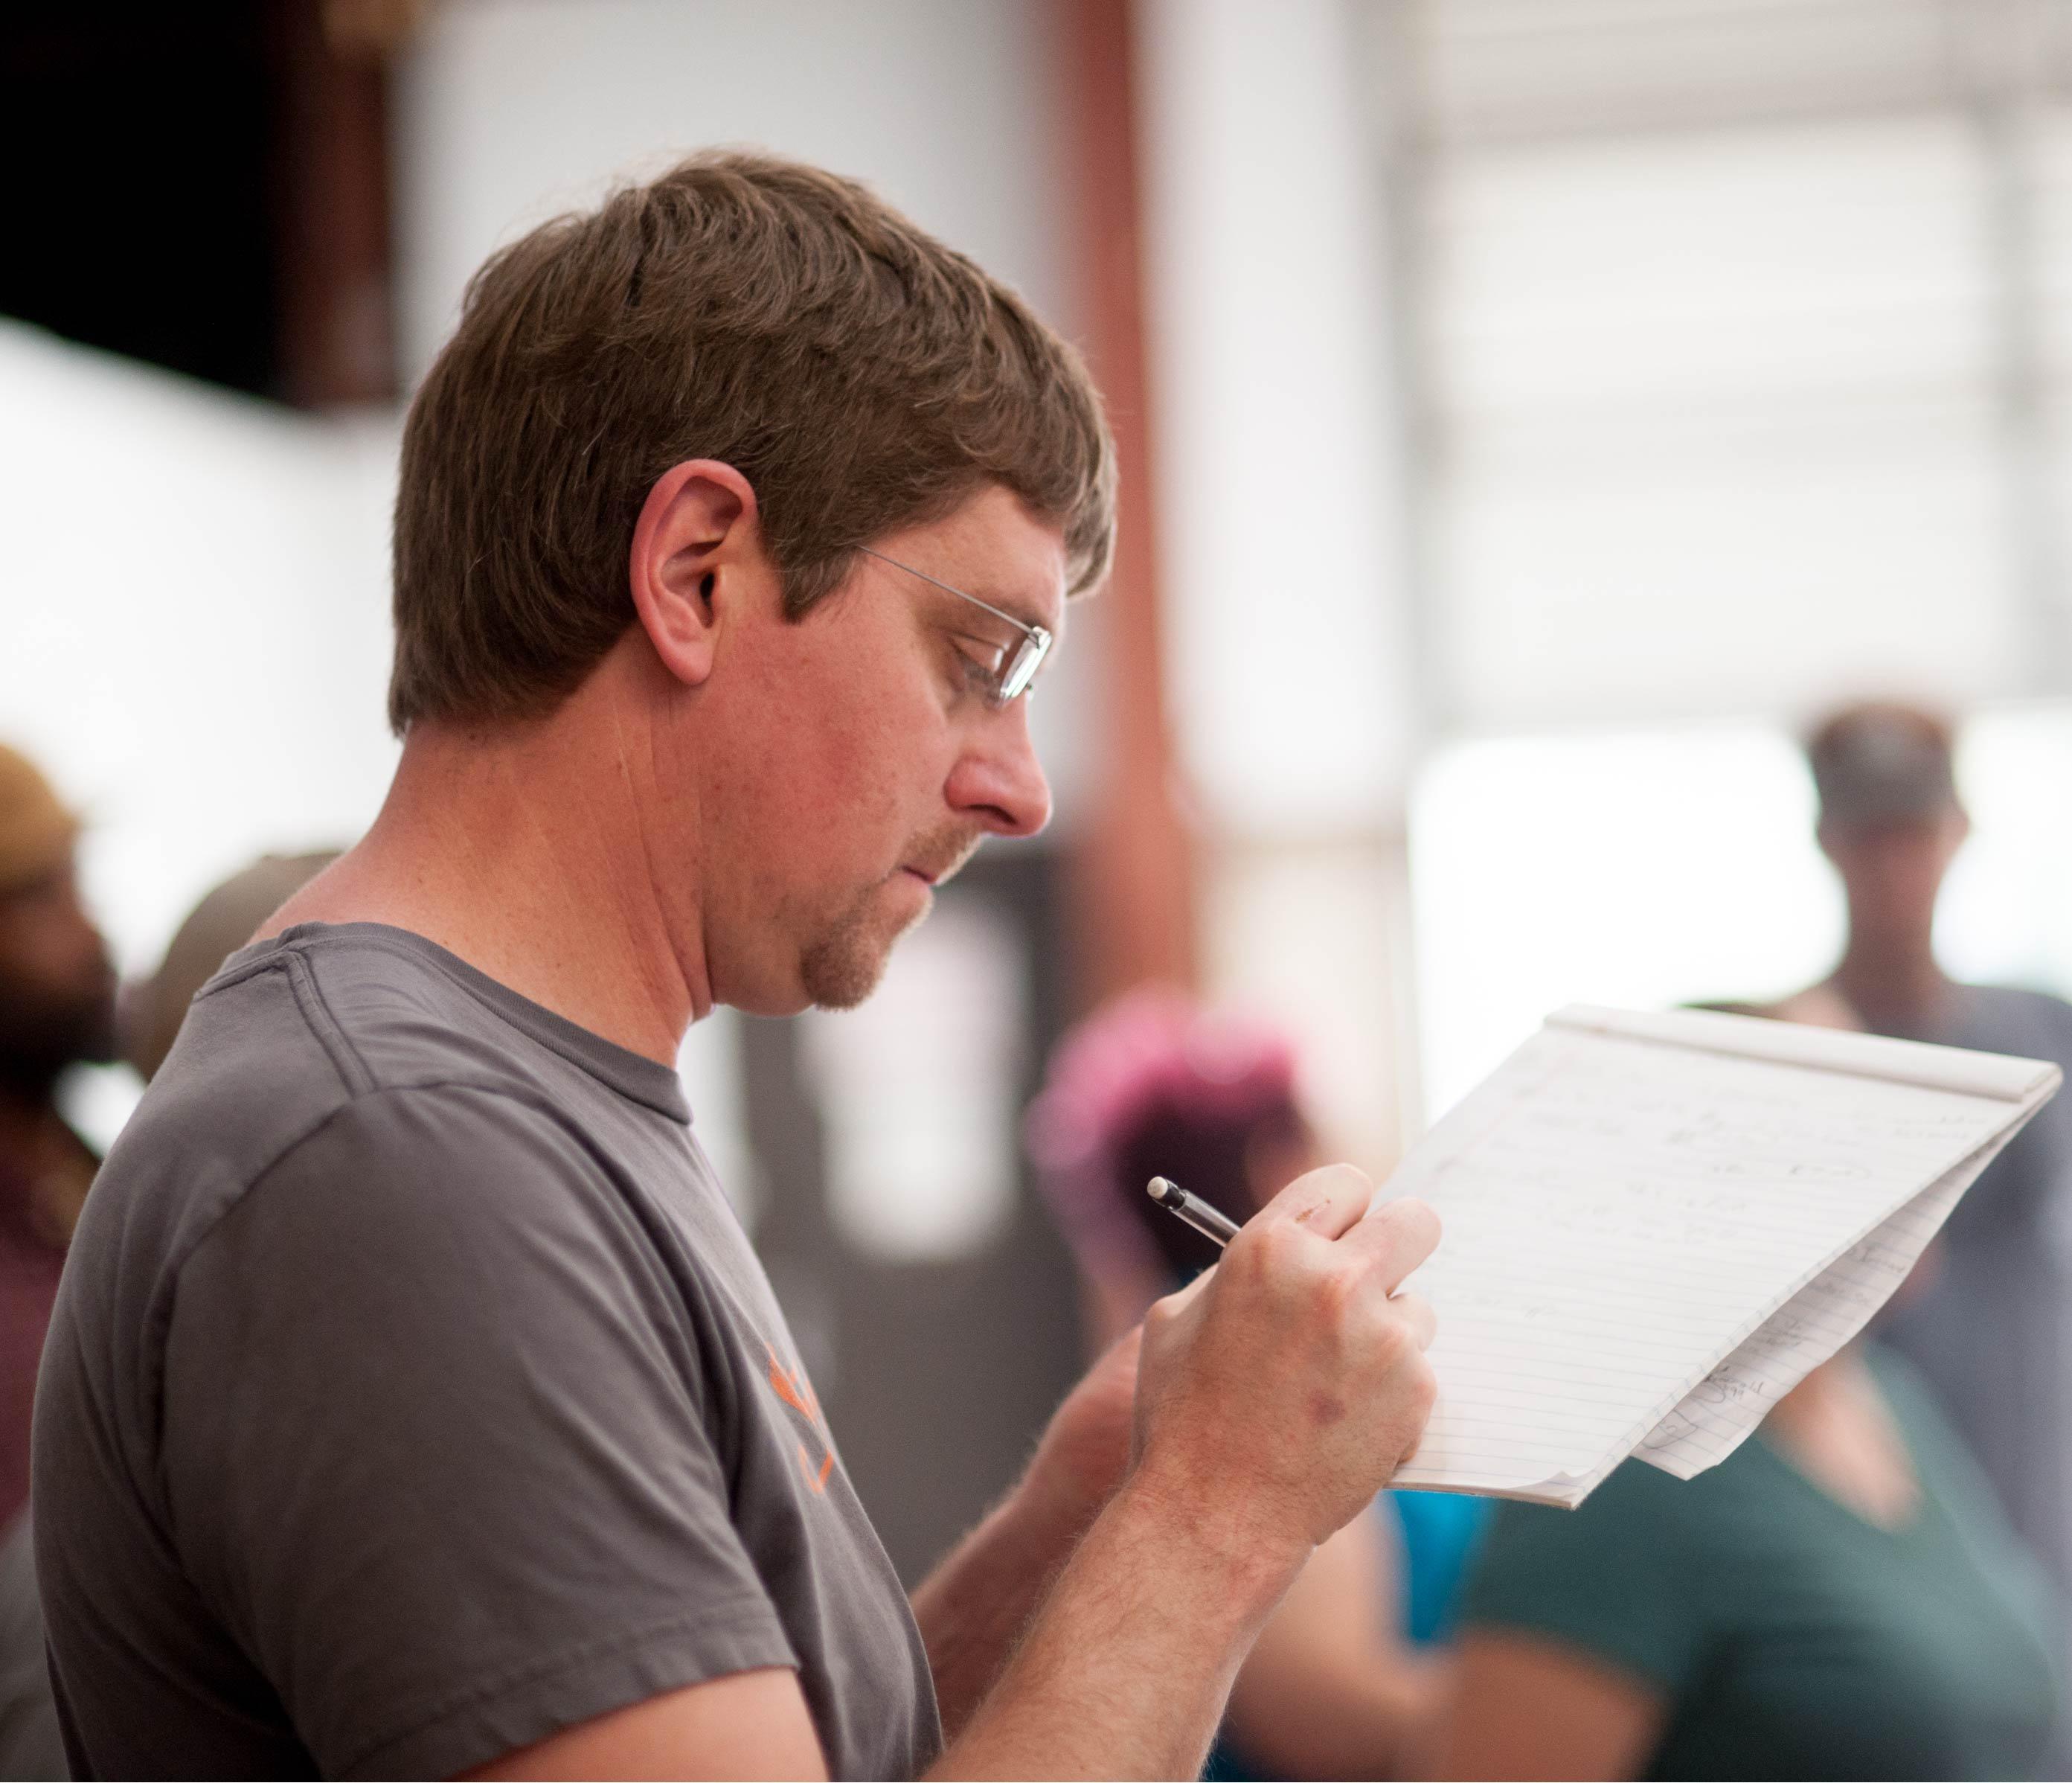 Image of man writing on notepad